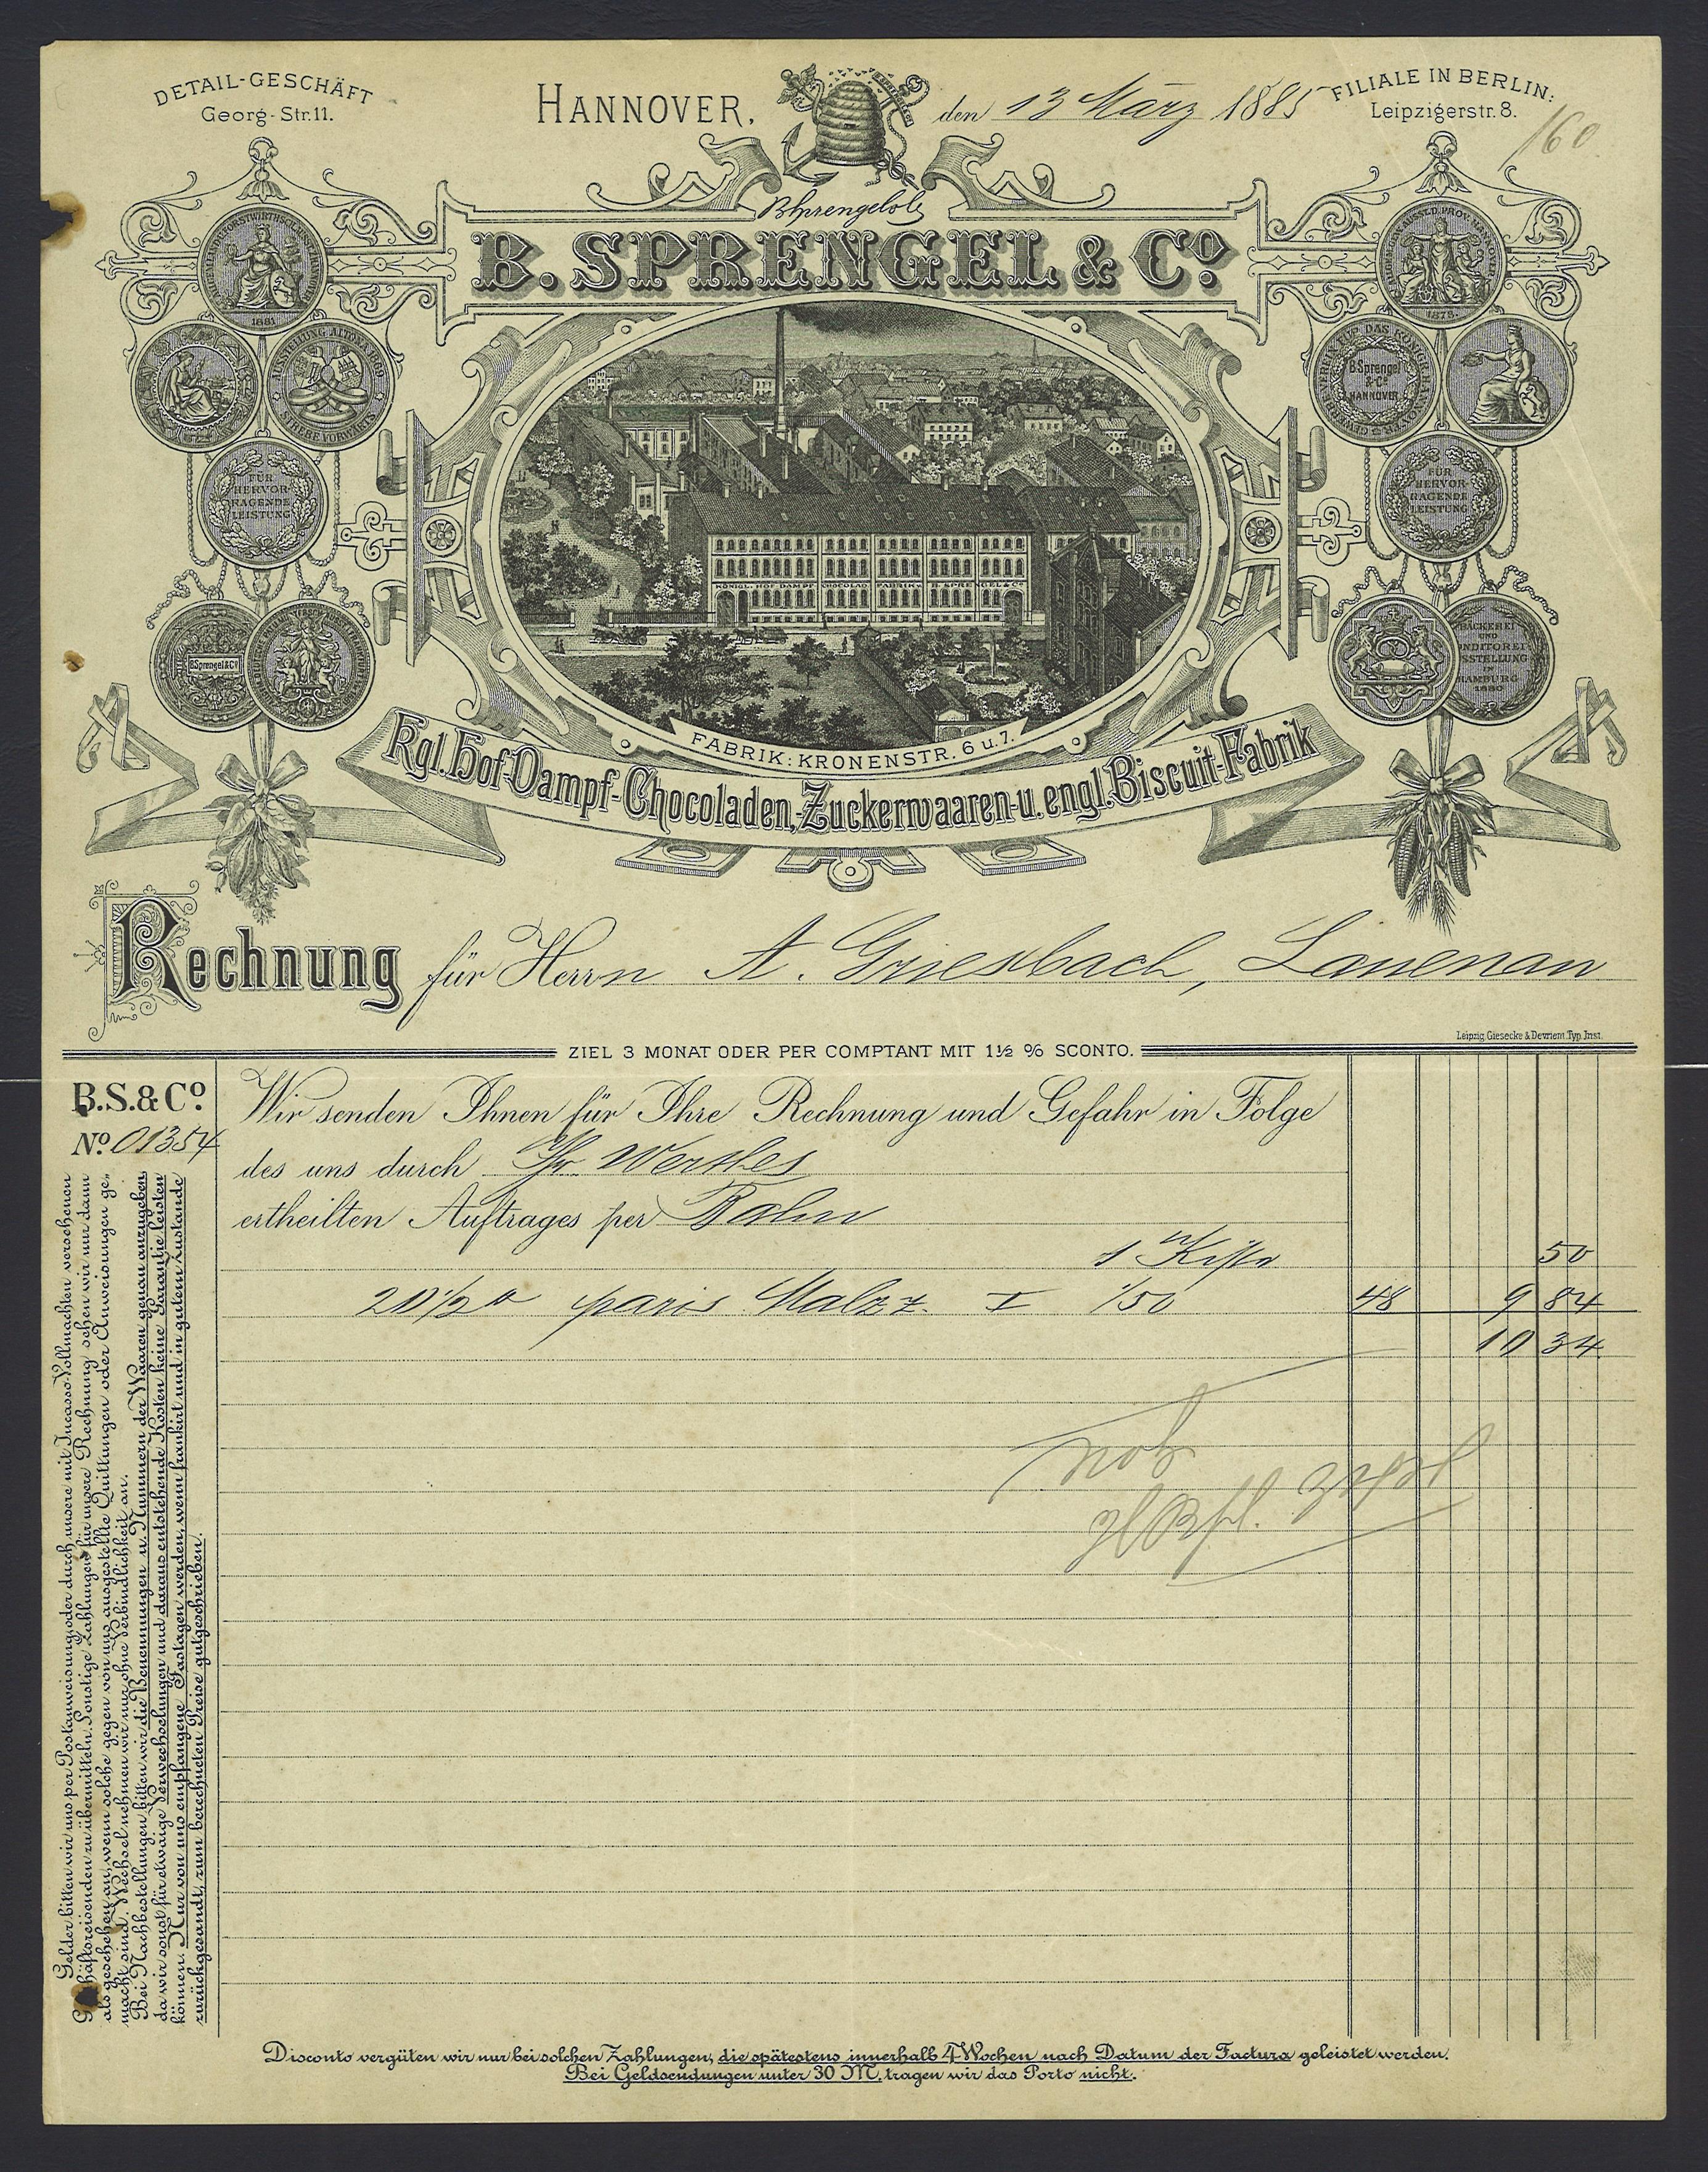 Dateib Sprengel Co 1885 03 13 Hannover Kronenstraße 6 7